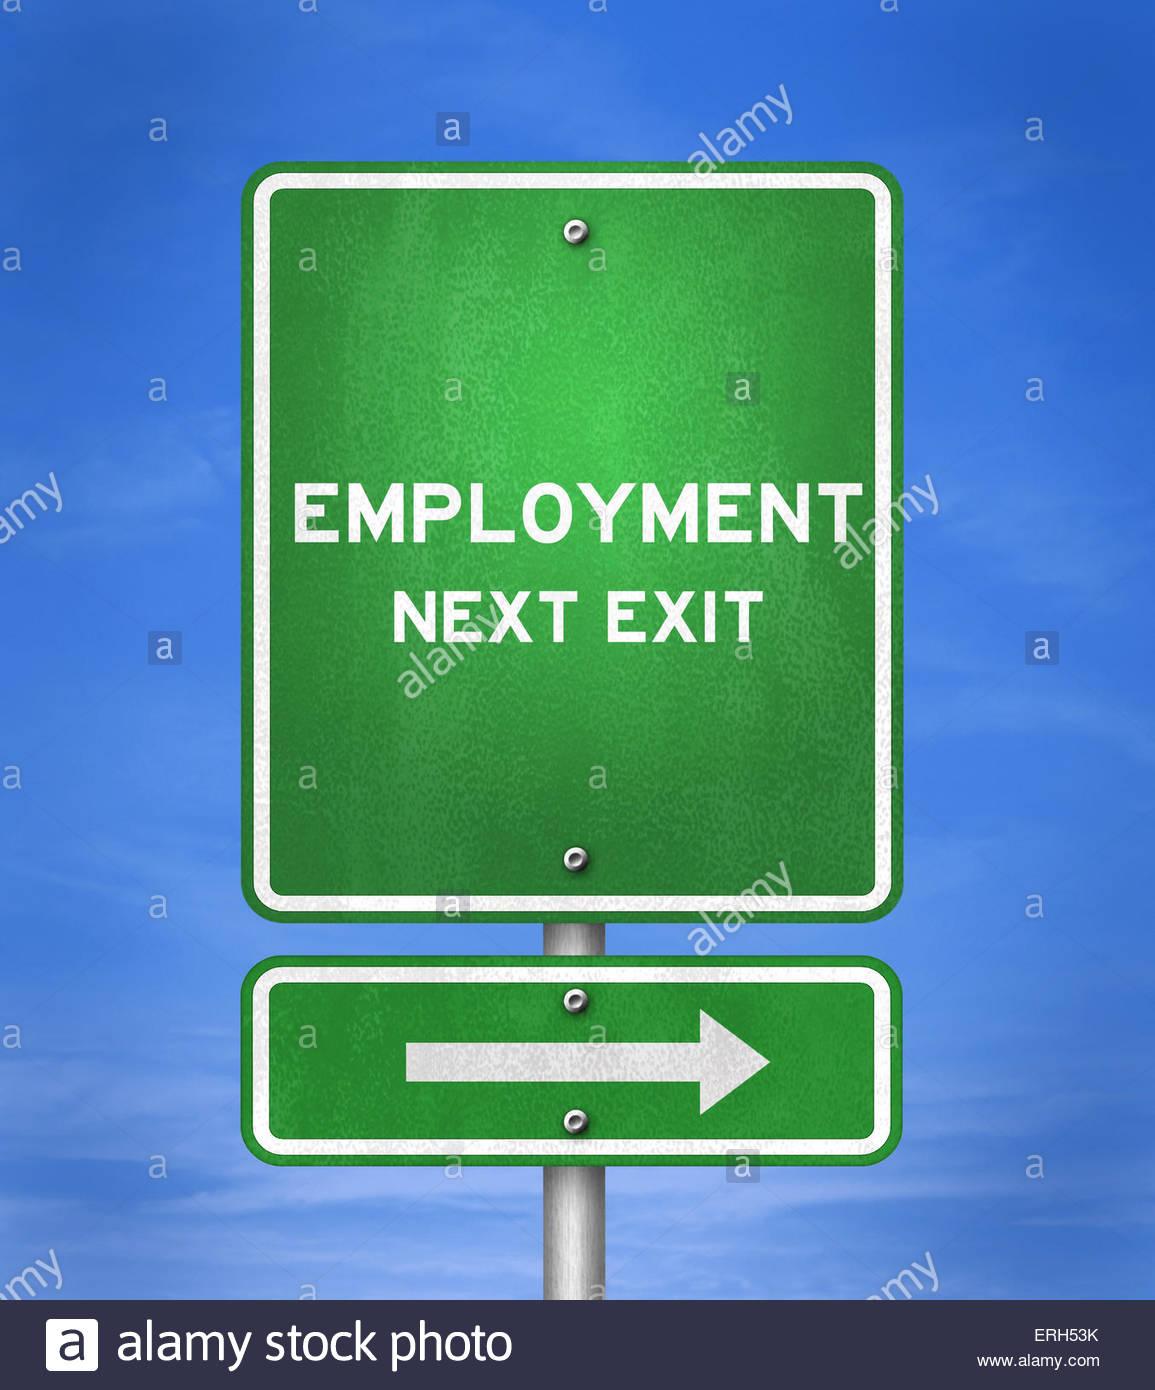 Employment - Next Exit - Stock Image